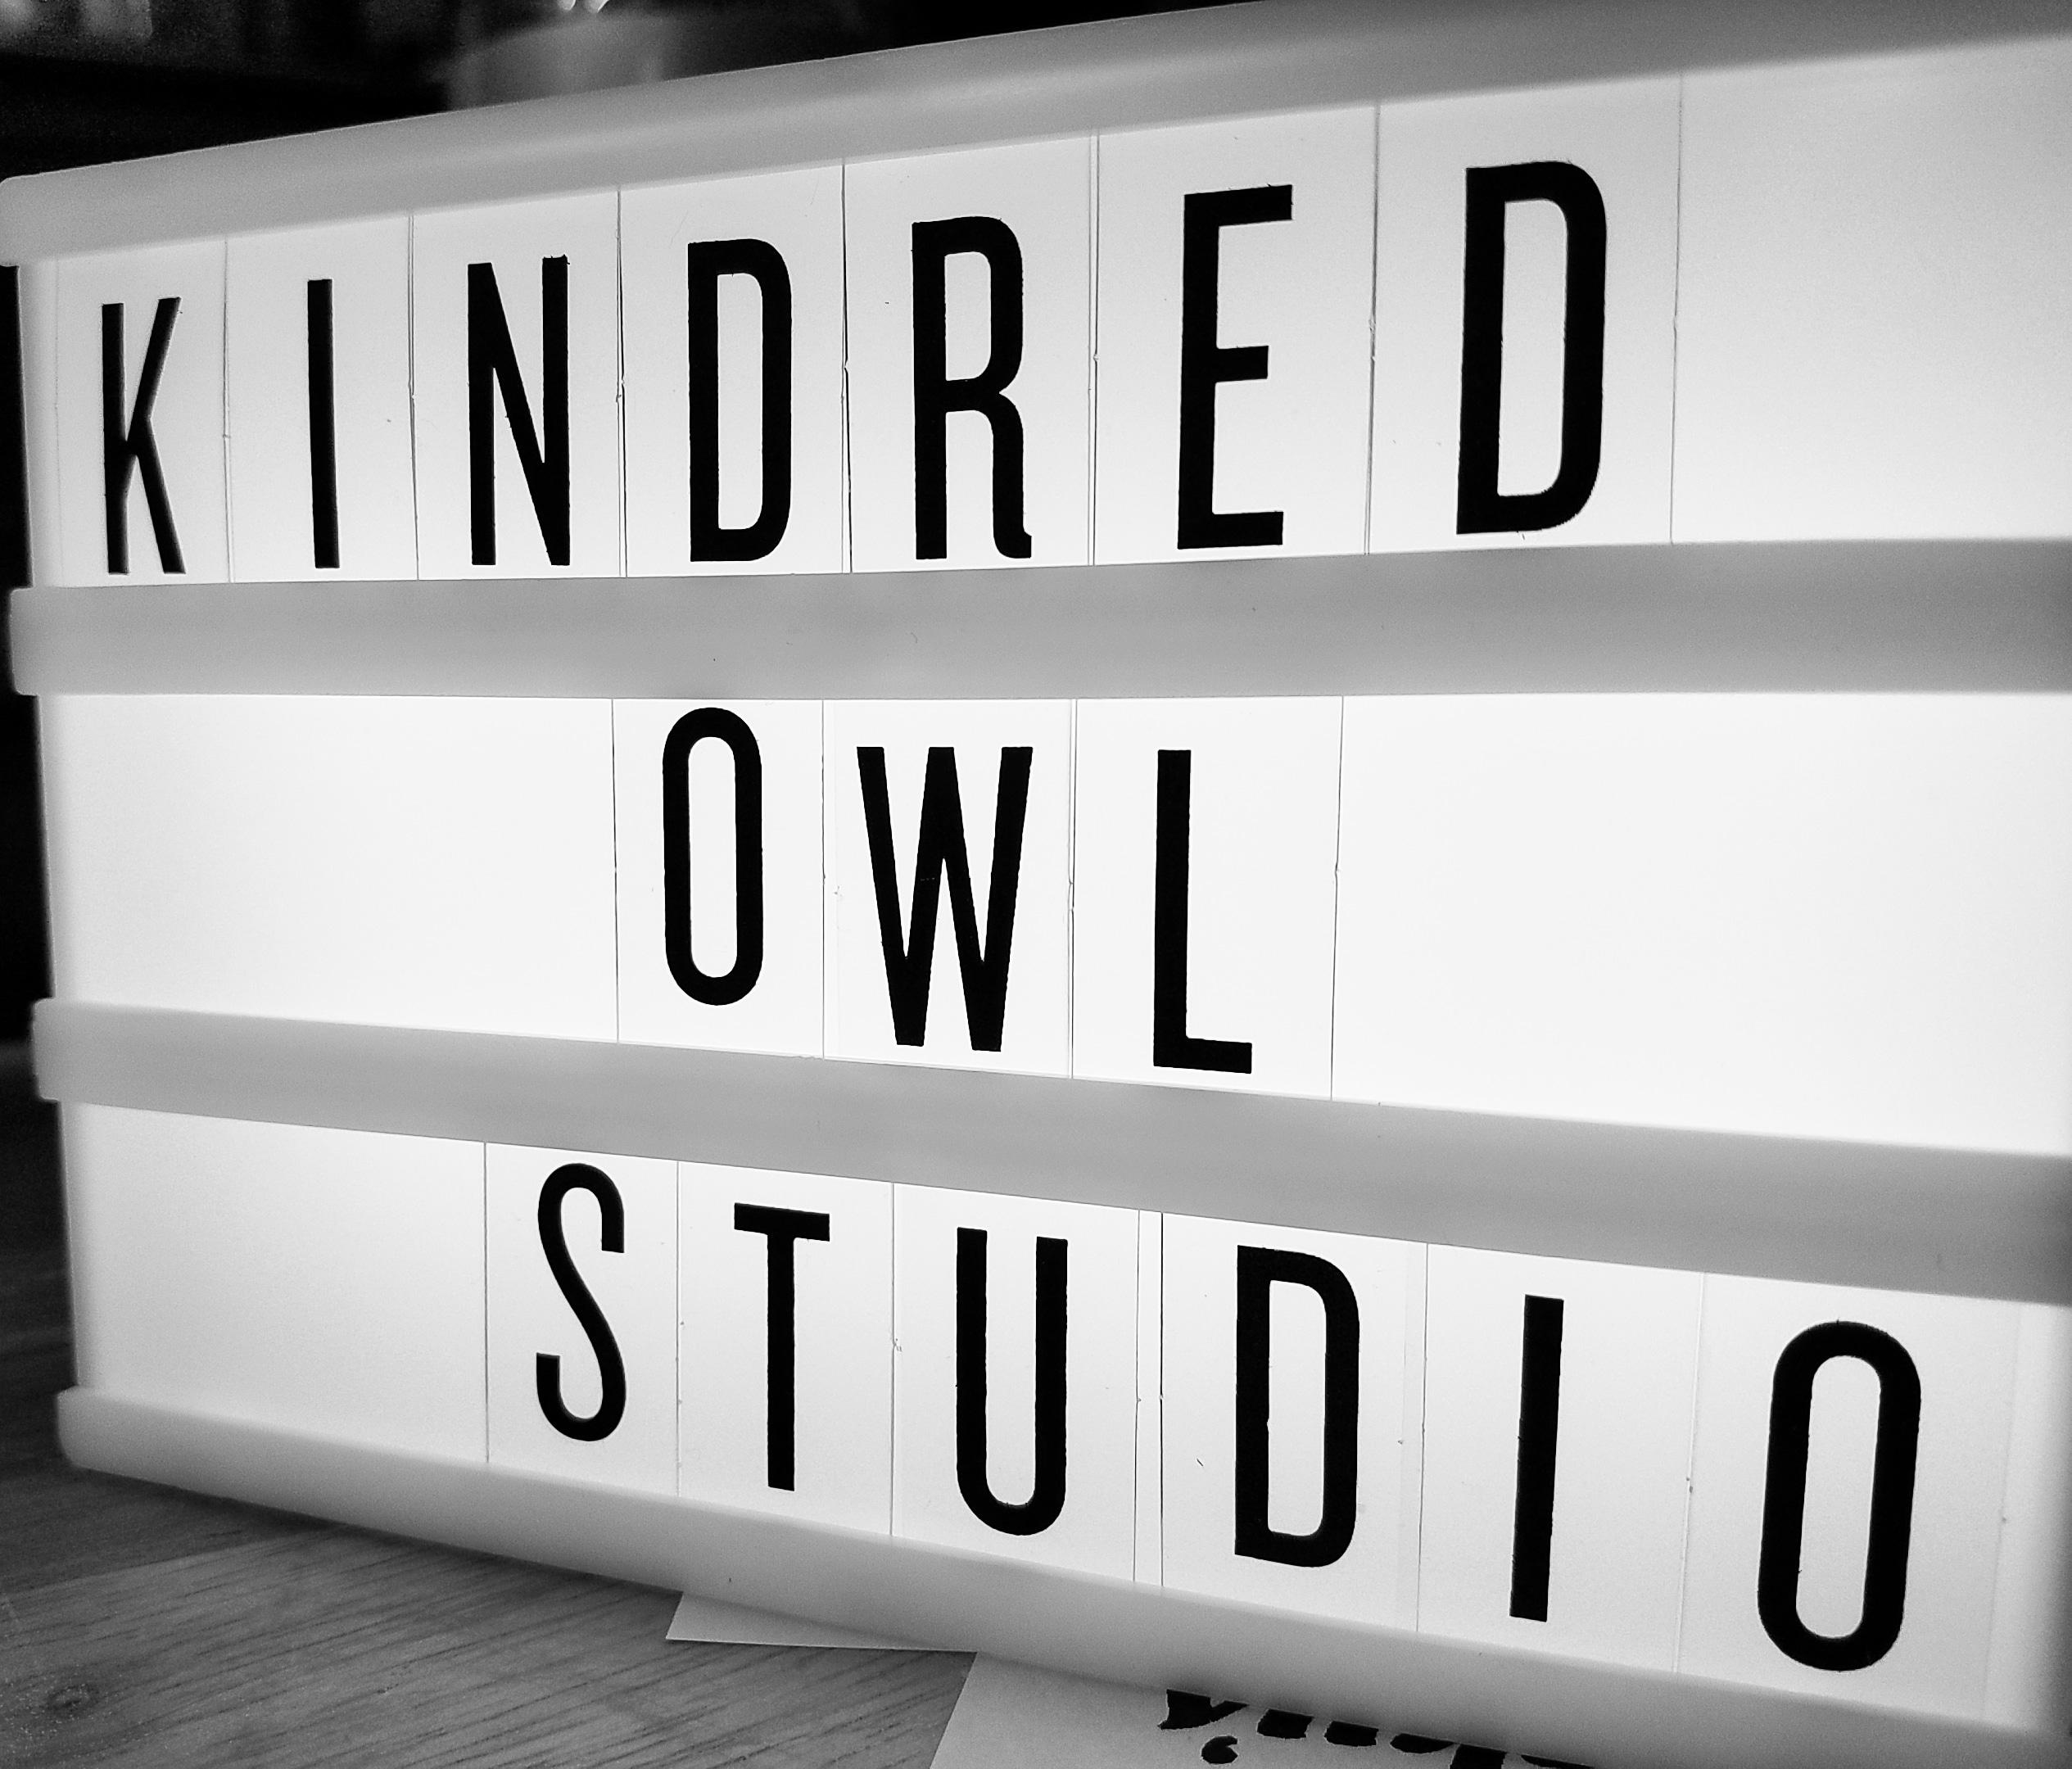 Kindred Owl Studio